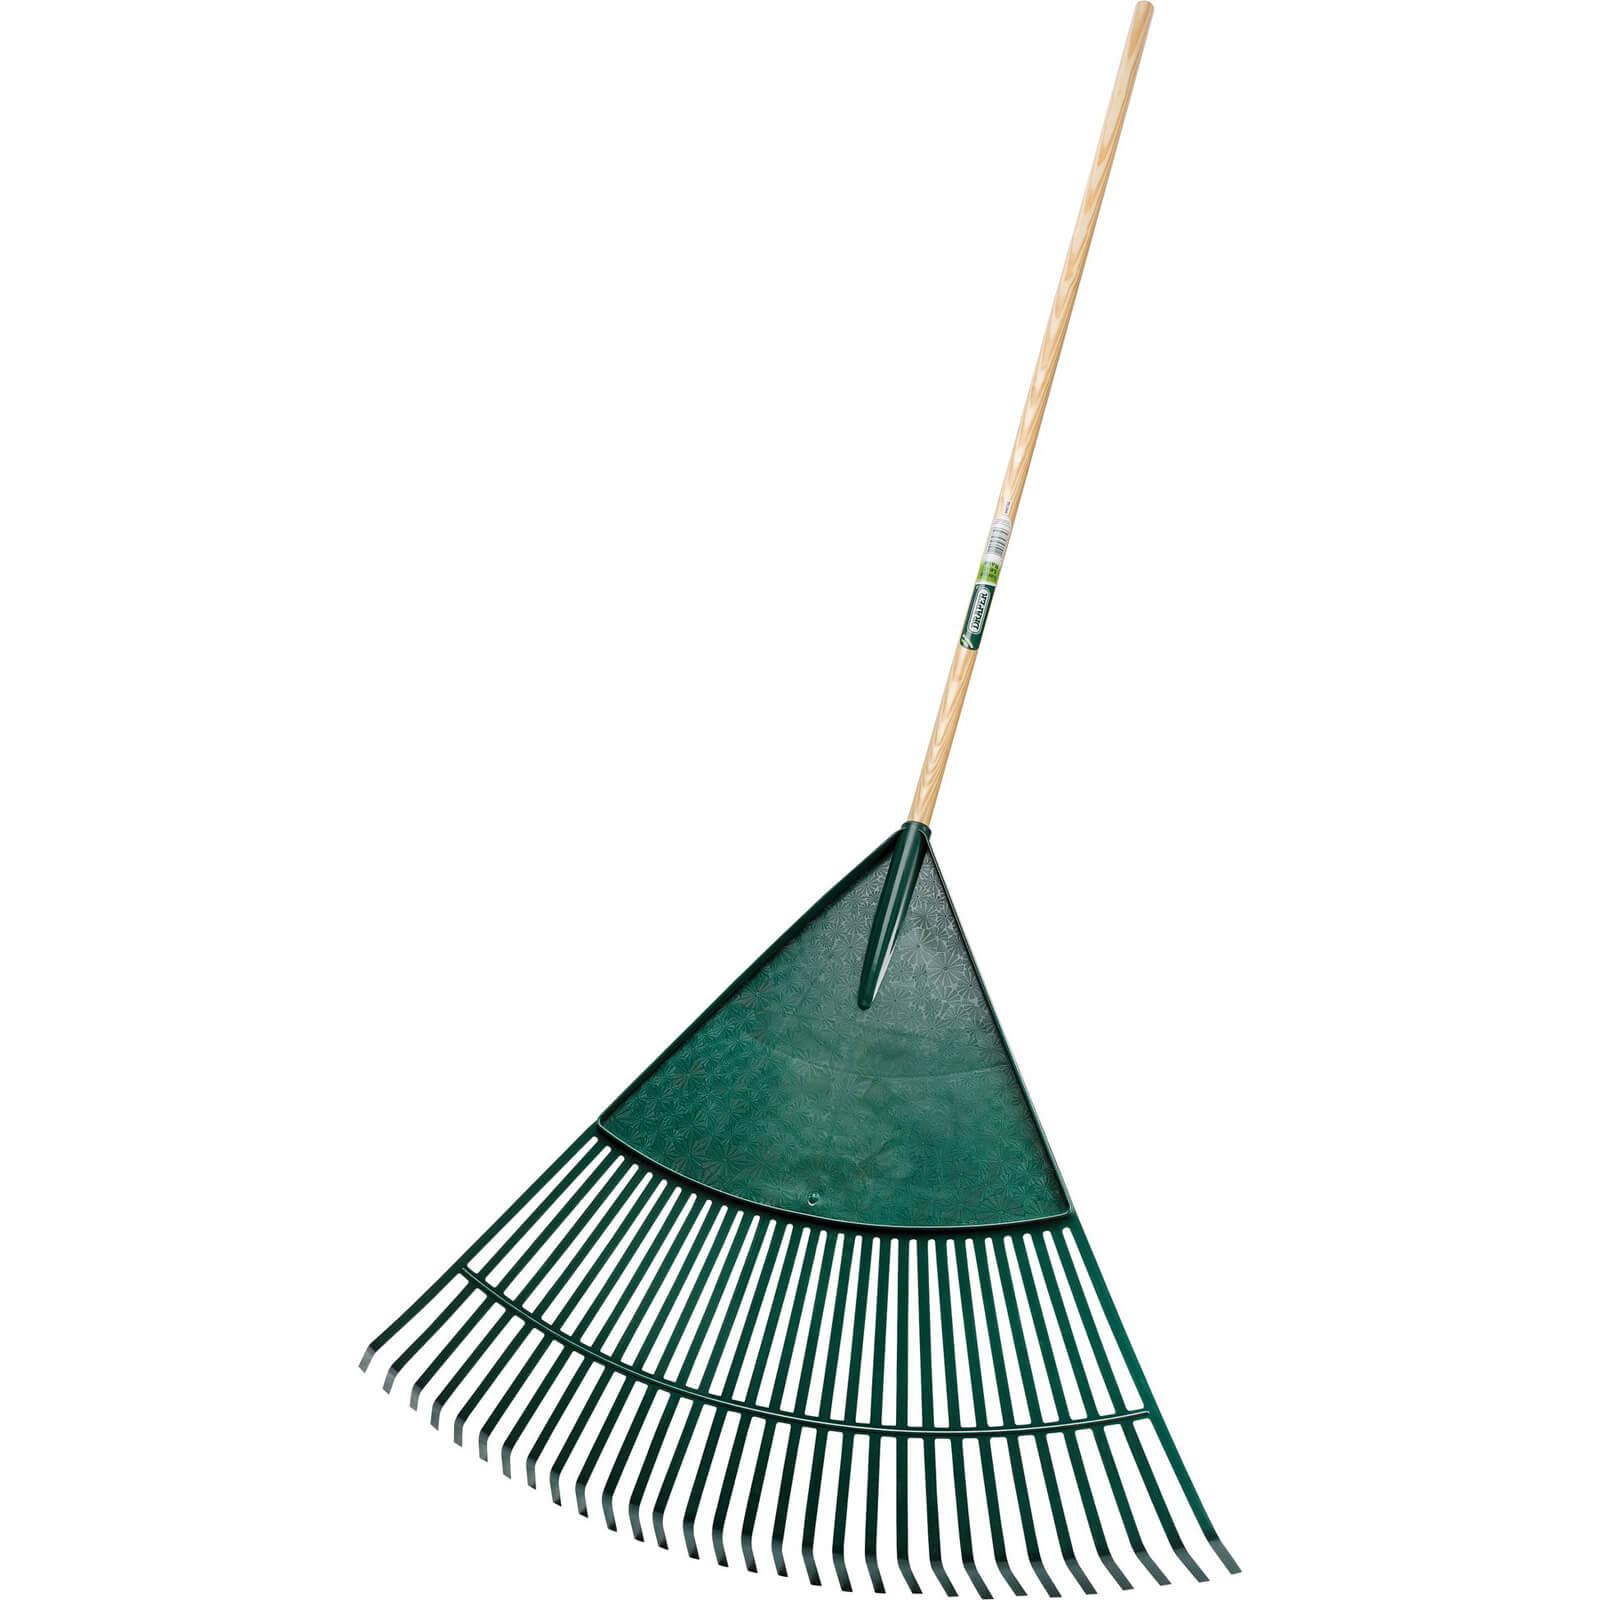 Draper Extra Wide Plastic Leaf Rake